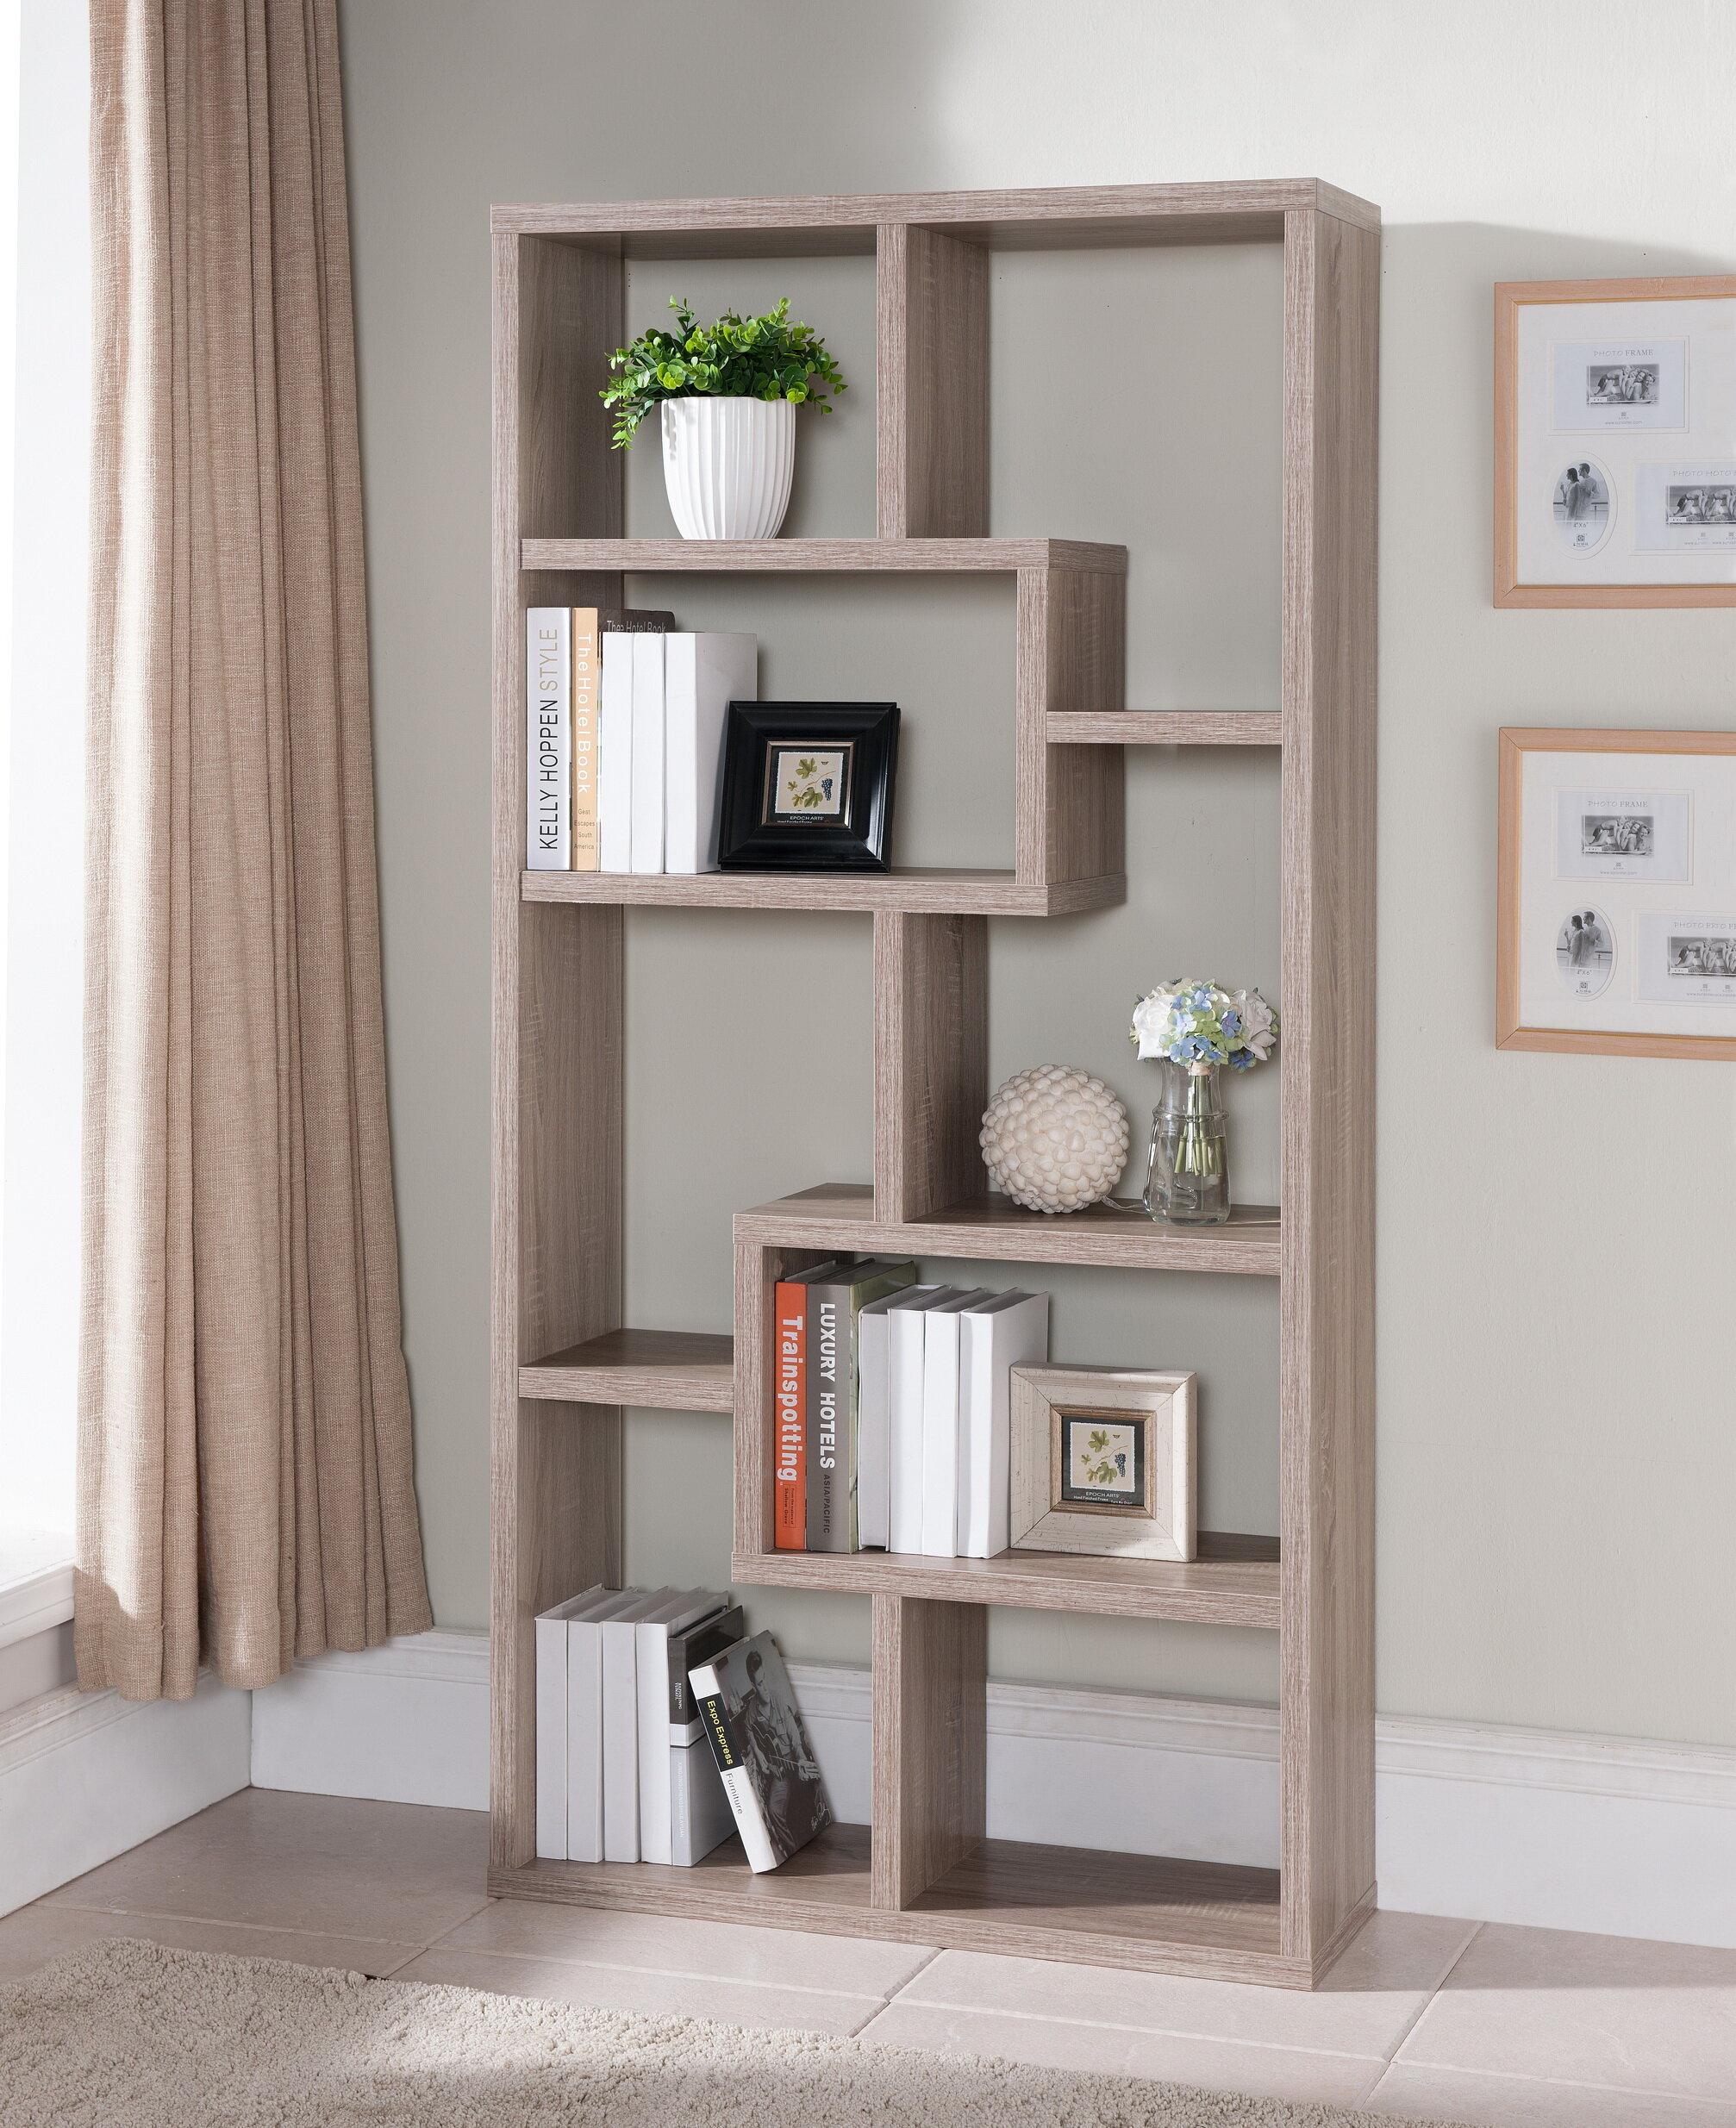 Hokku Designs Cube Unit Bookcase U0026 Reviews | Wayfair